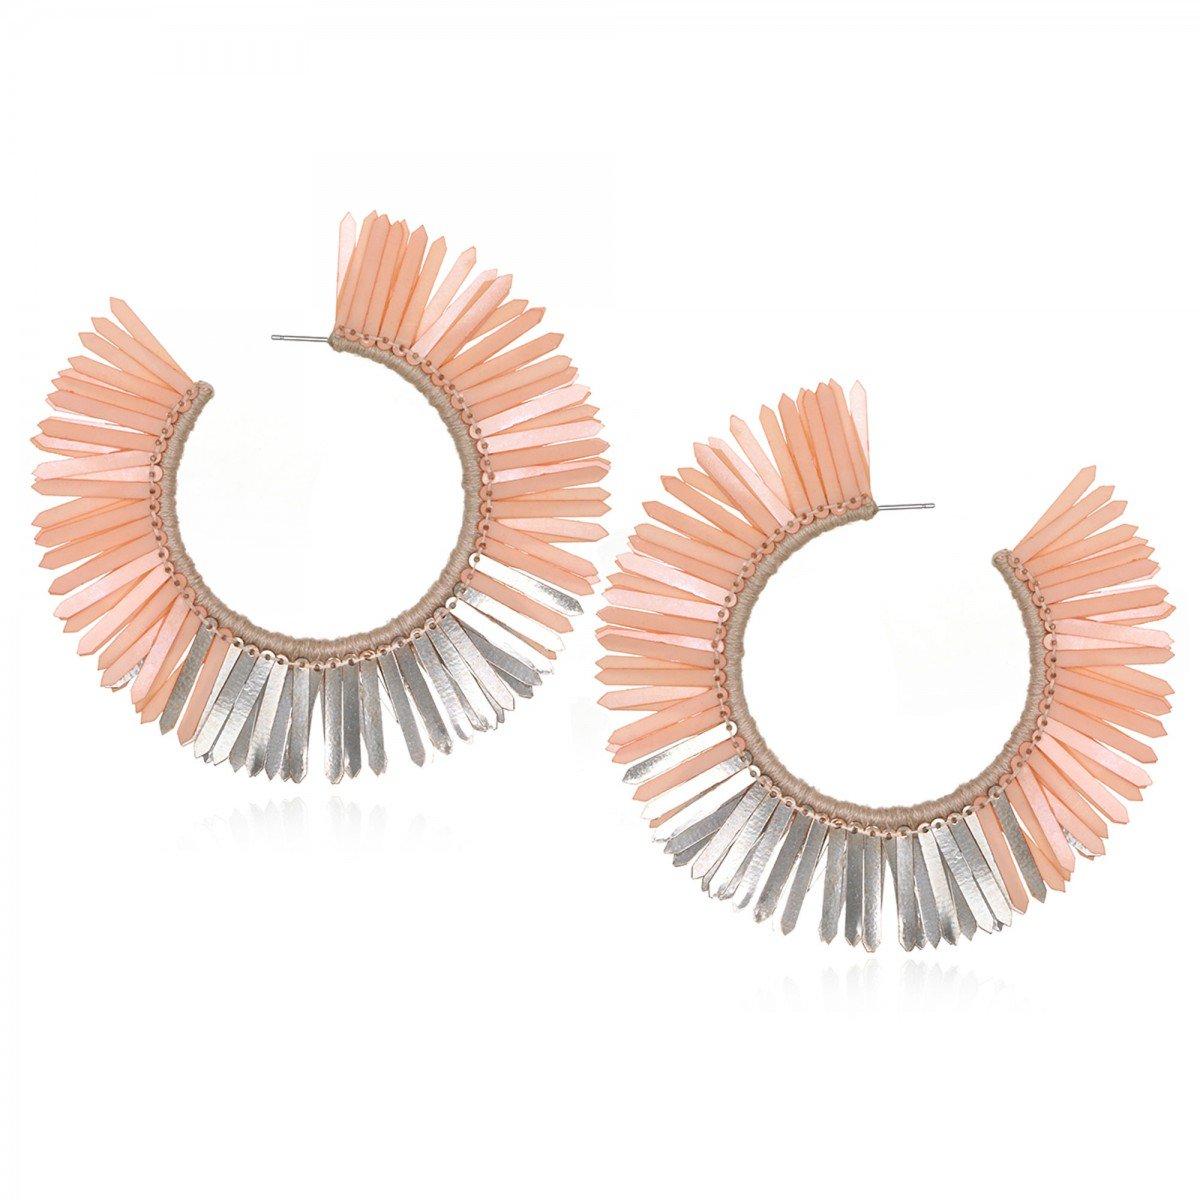 Blush Karaja Hoop Earrings by SUZANNA DAI